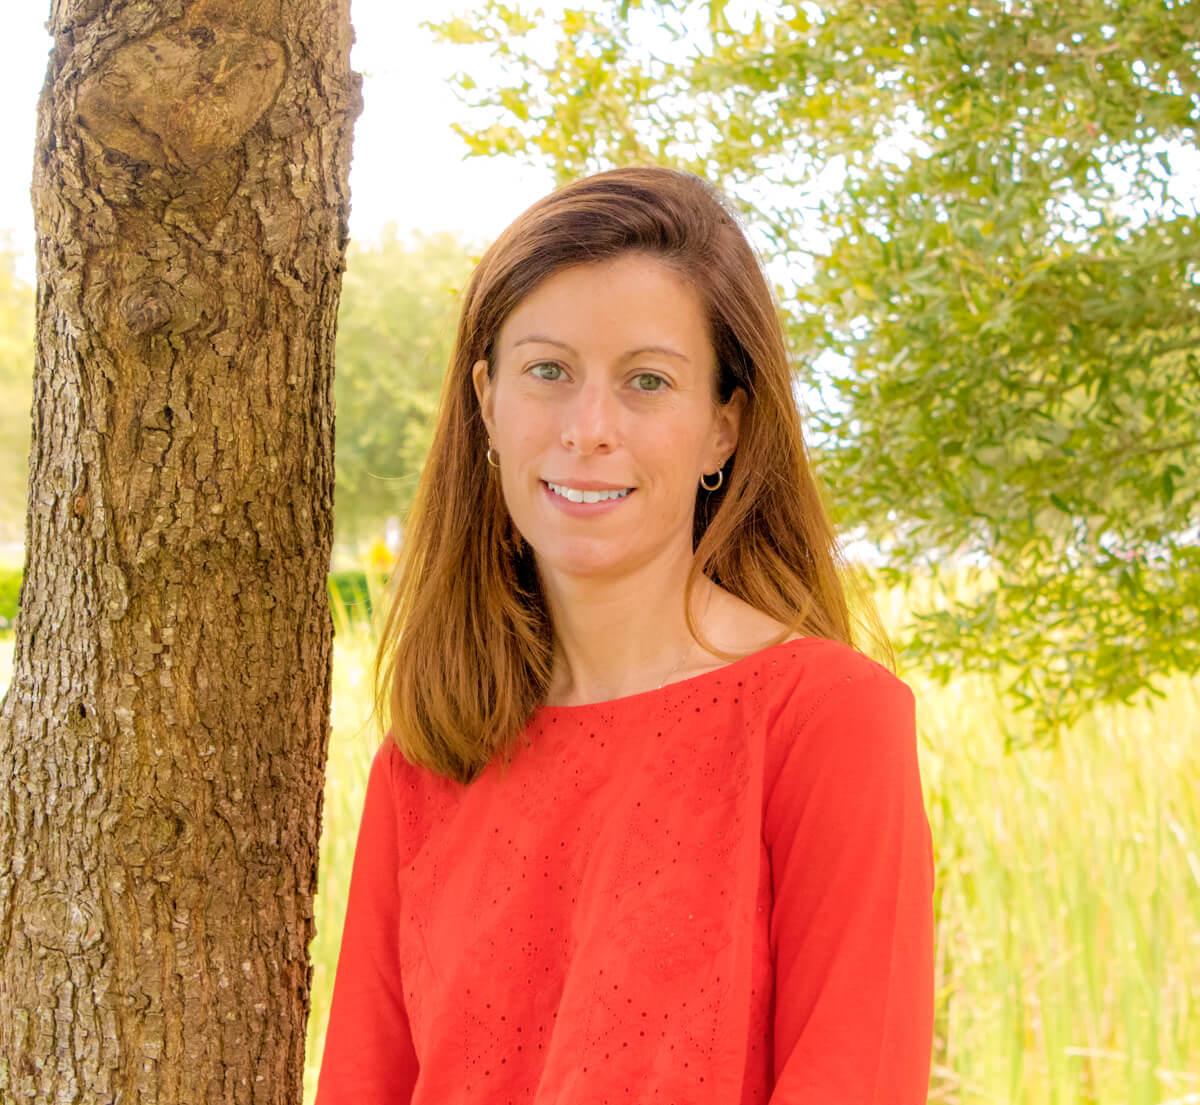 Leah McCormack